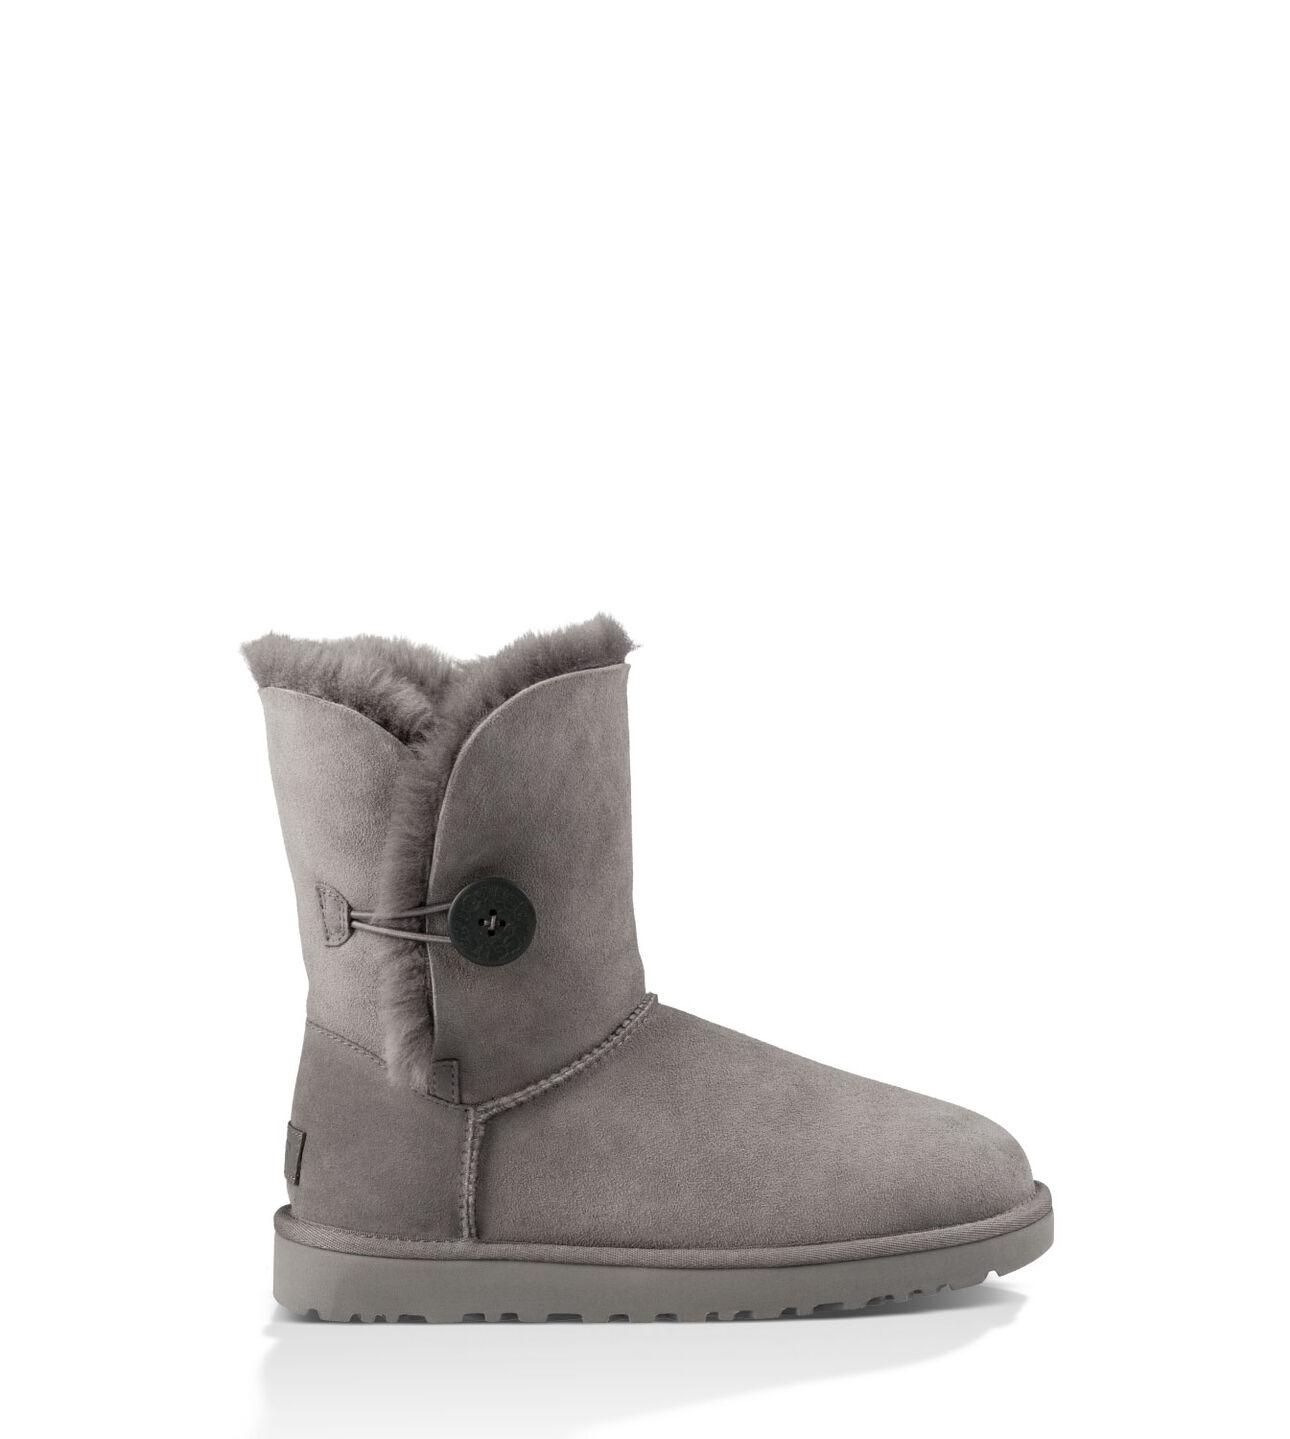 ugg174 bailey button ii classic boots for women ugg174 uk